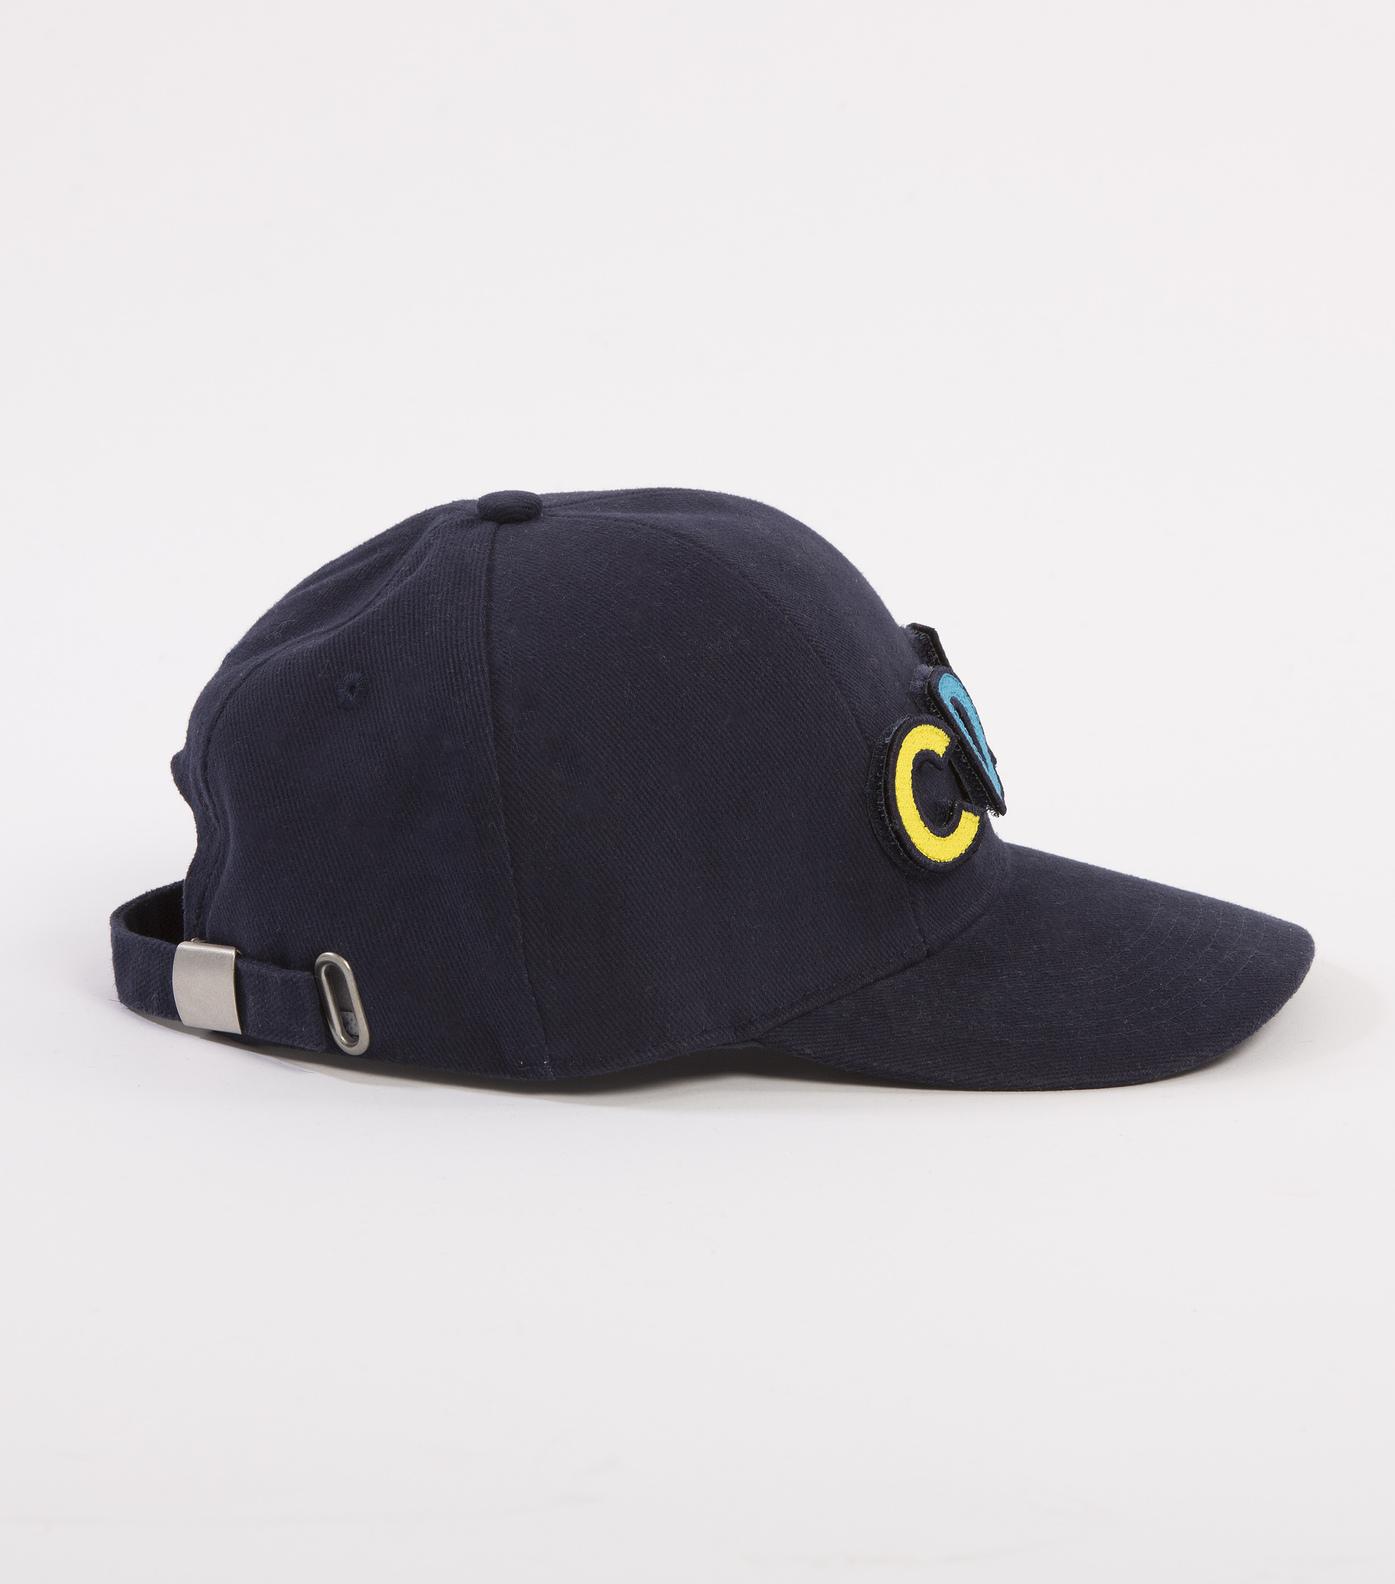 CAP CDP MULTI  - Navy